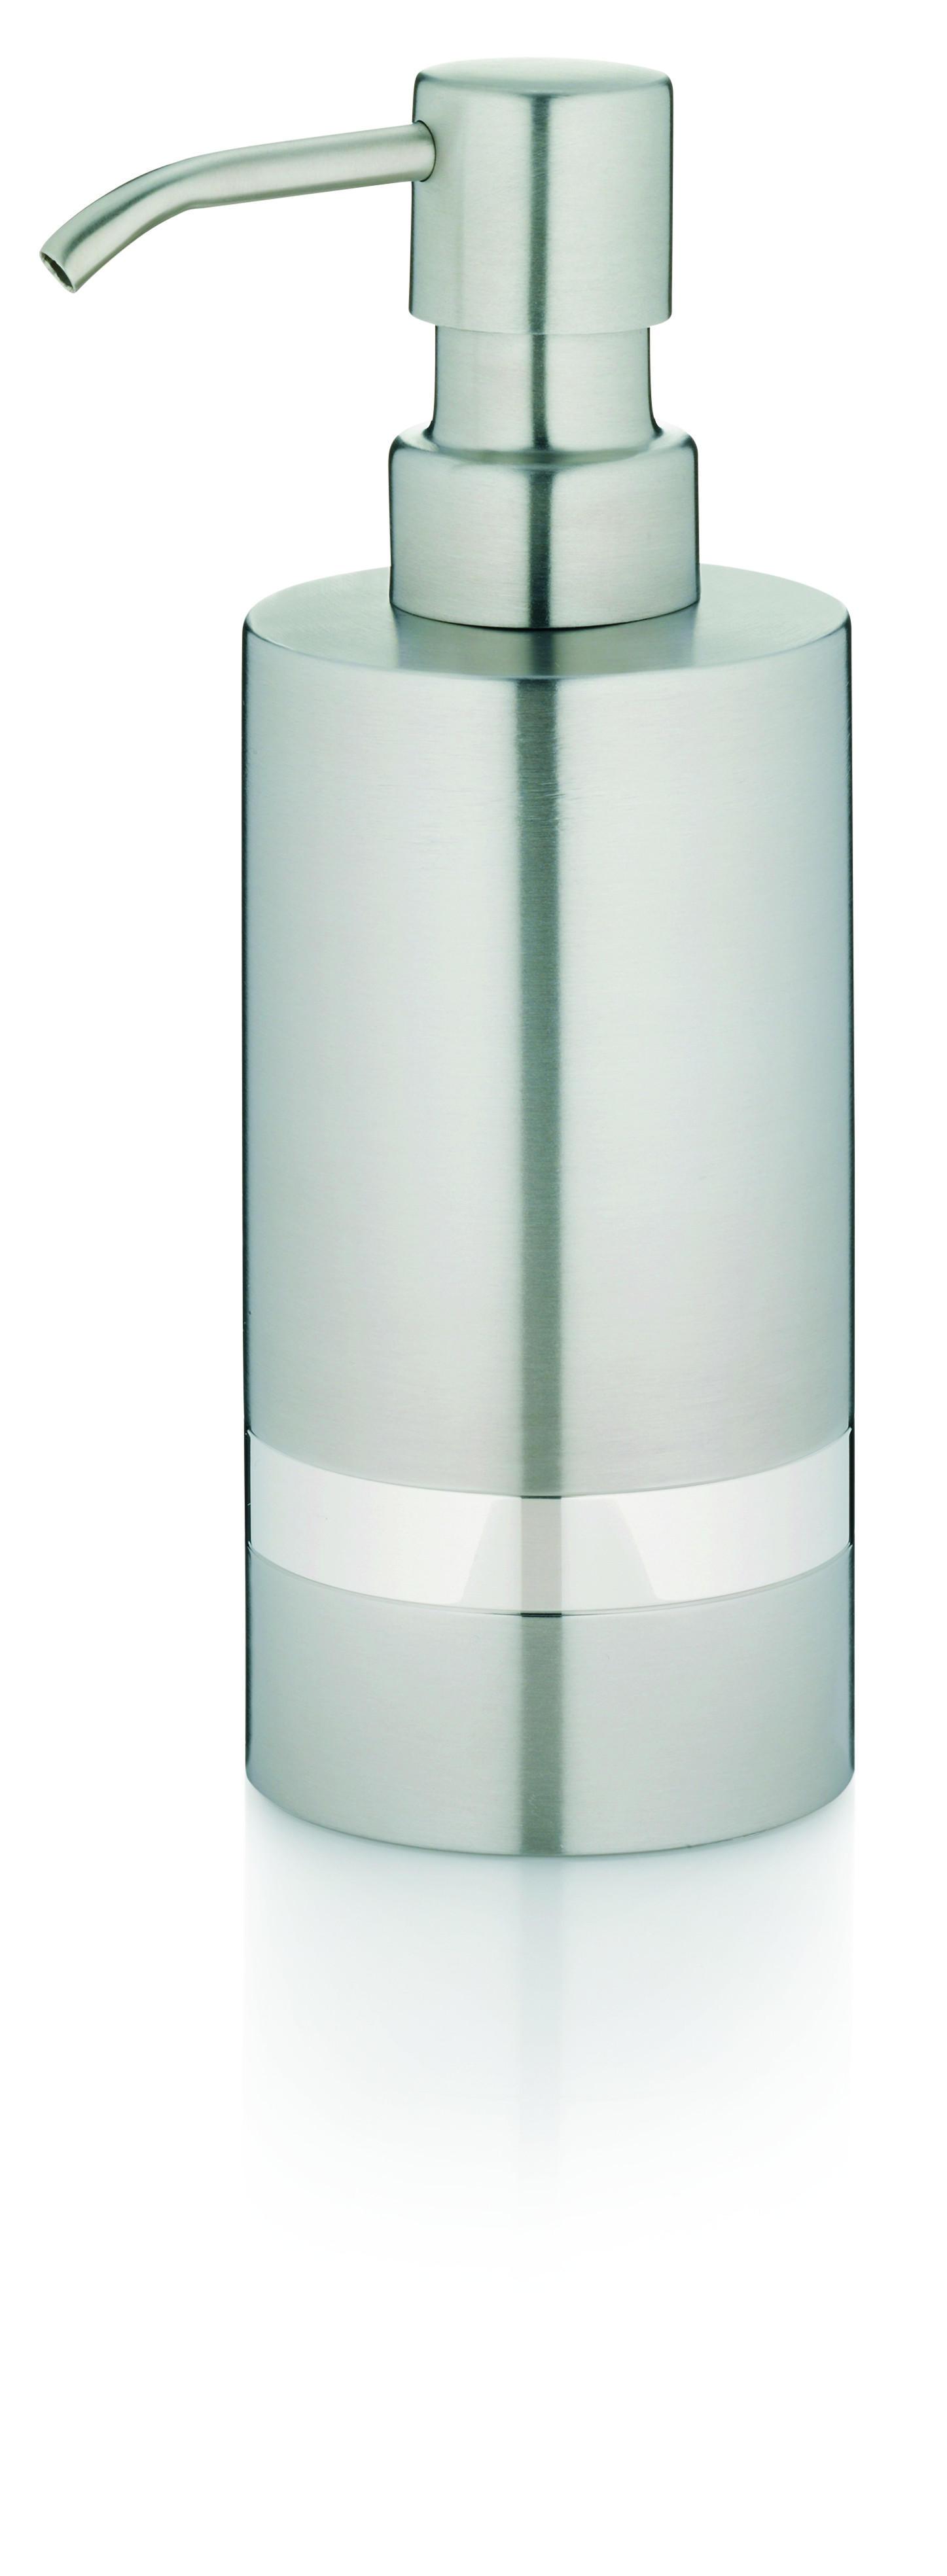 SEIFENSPENDER - Silberfarben, Metall (6/17,5cm)